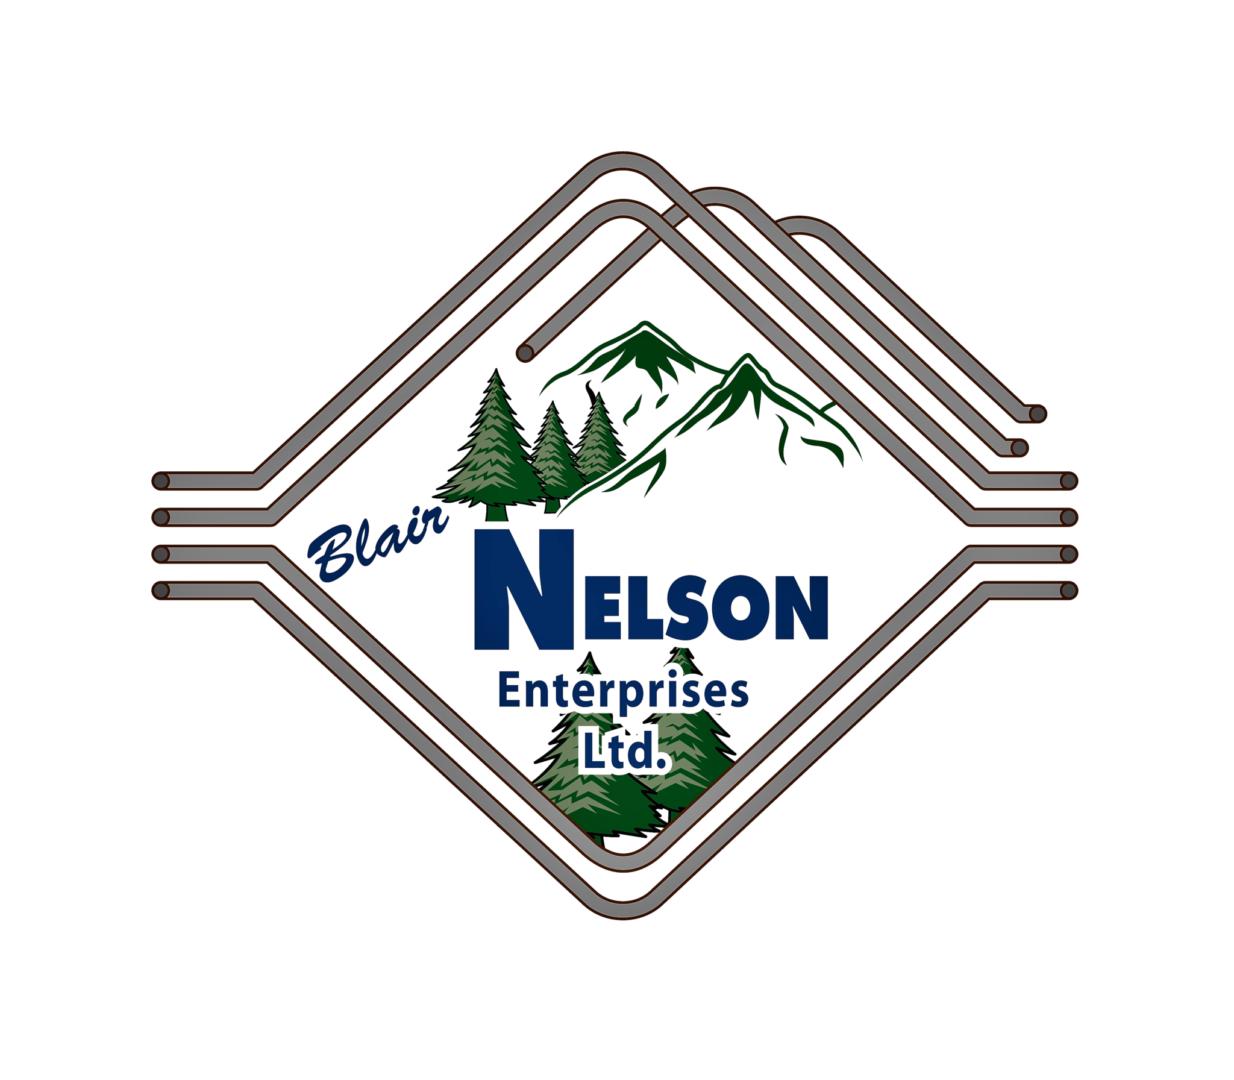 Blair Nelson Enterprises LTD